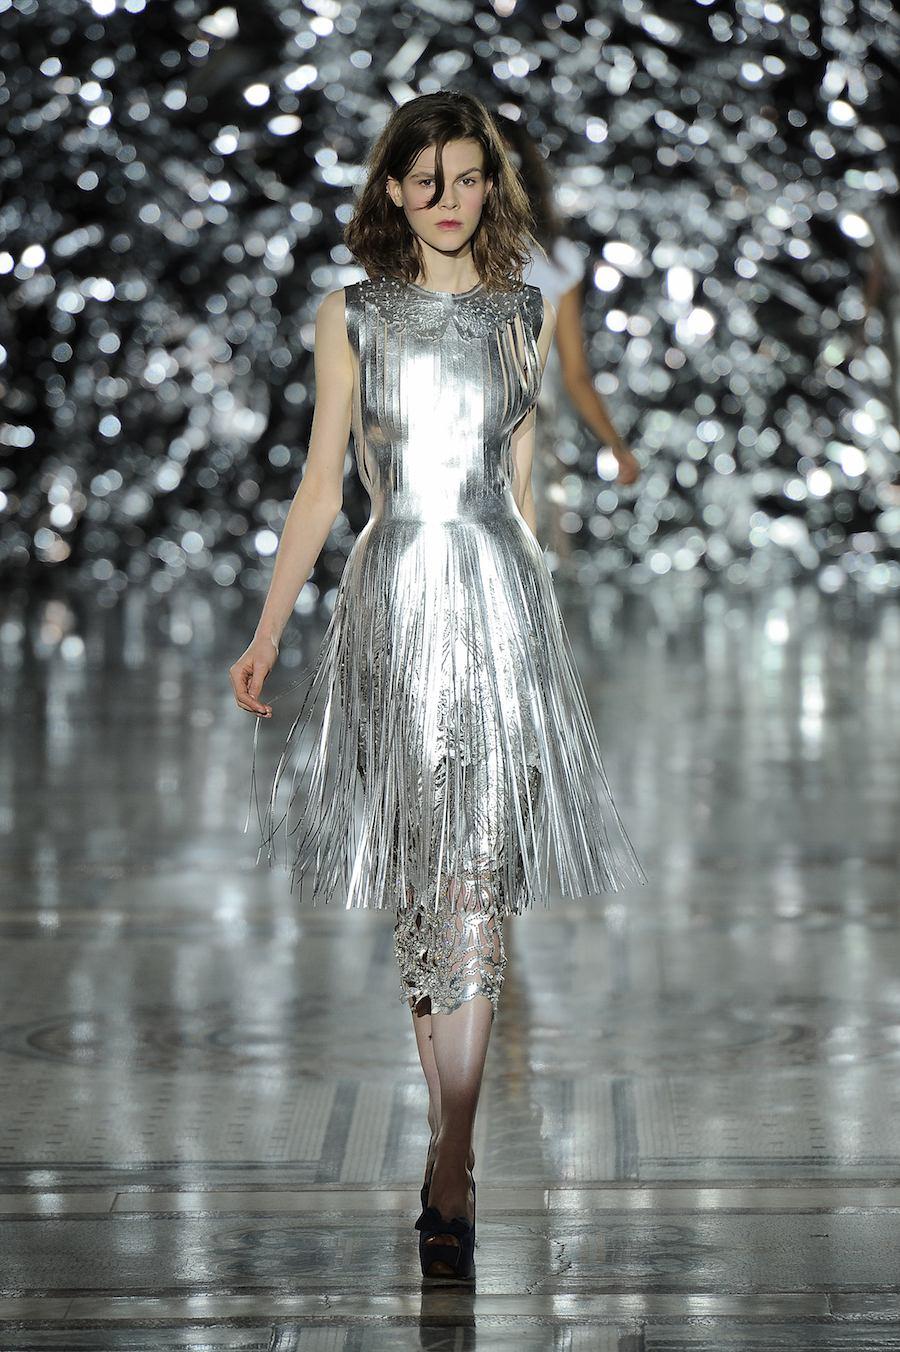 Metallic Leather Fringe Dress by Giles Deacon.